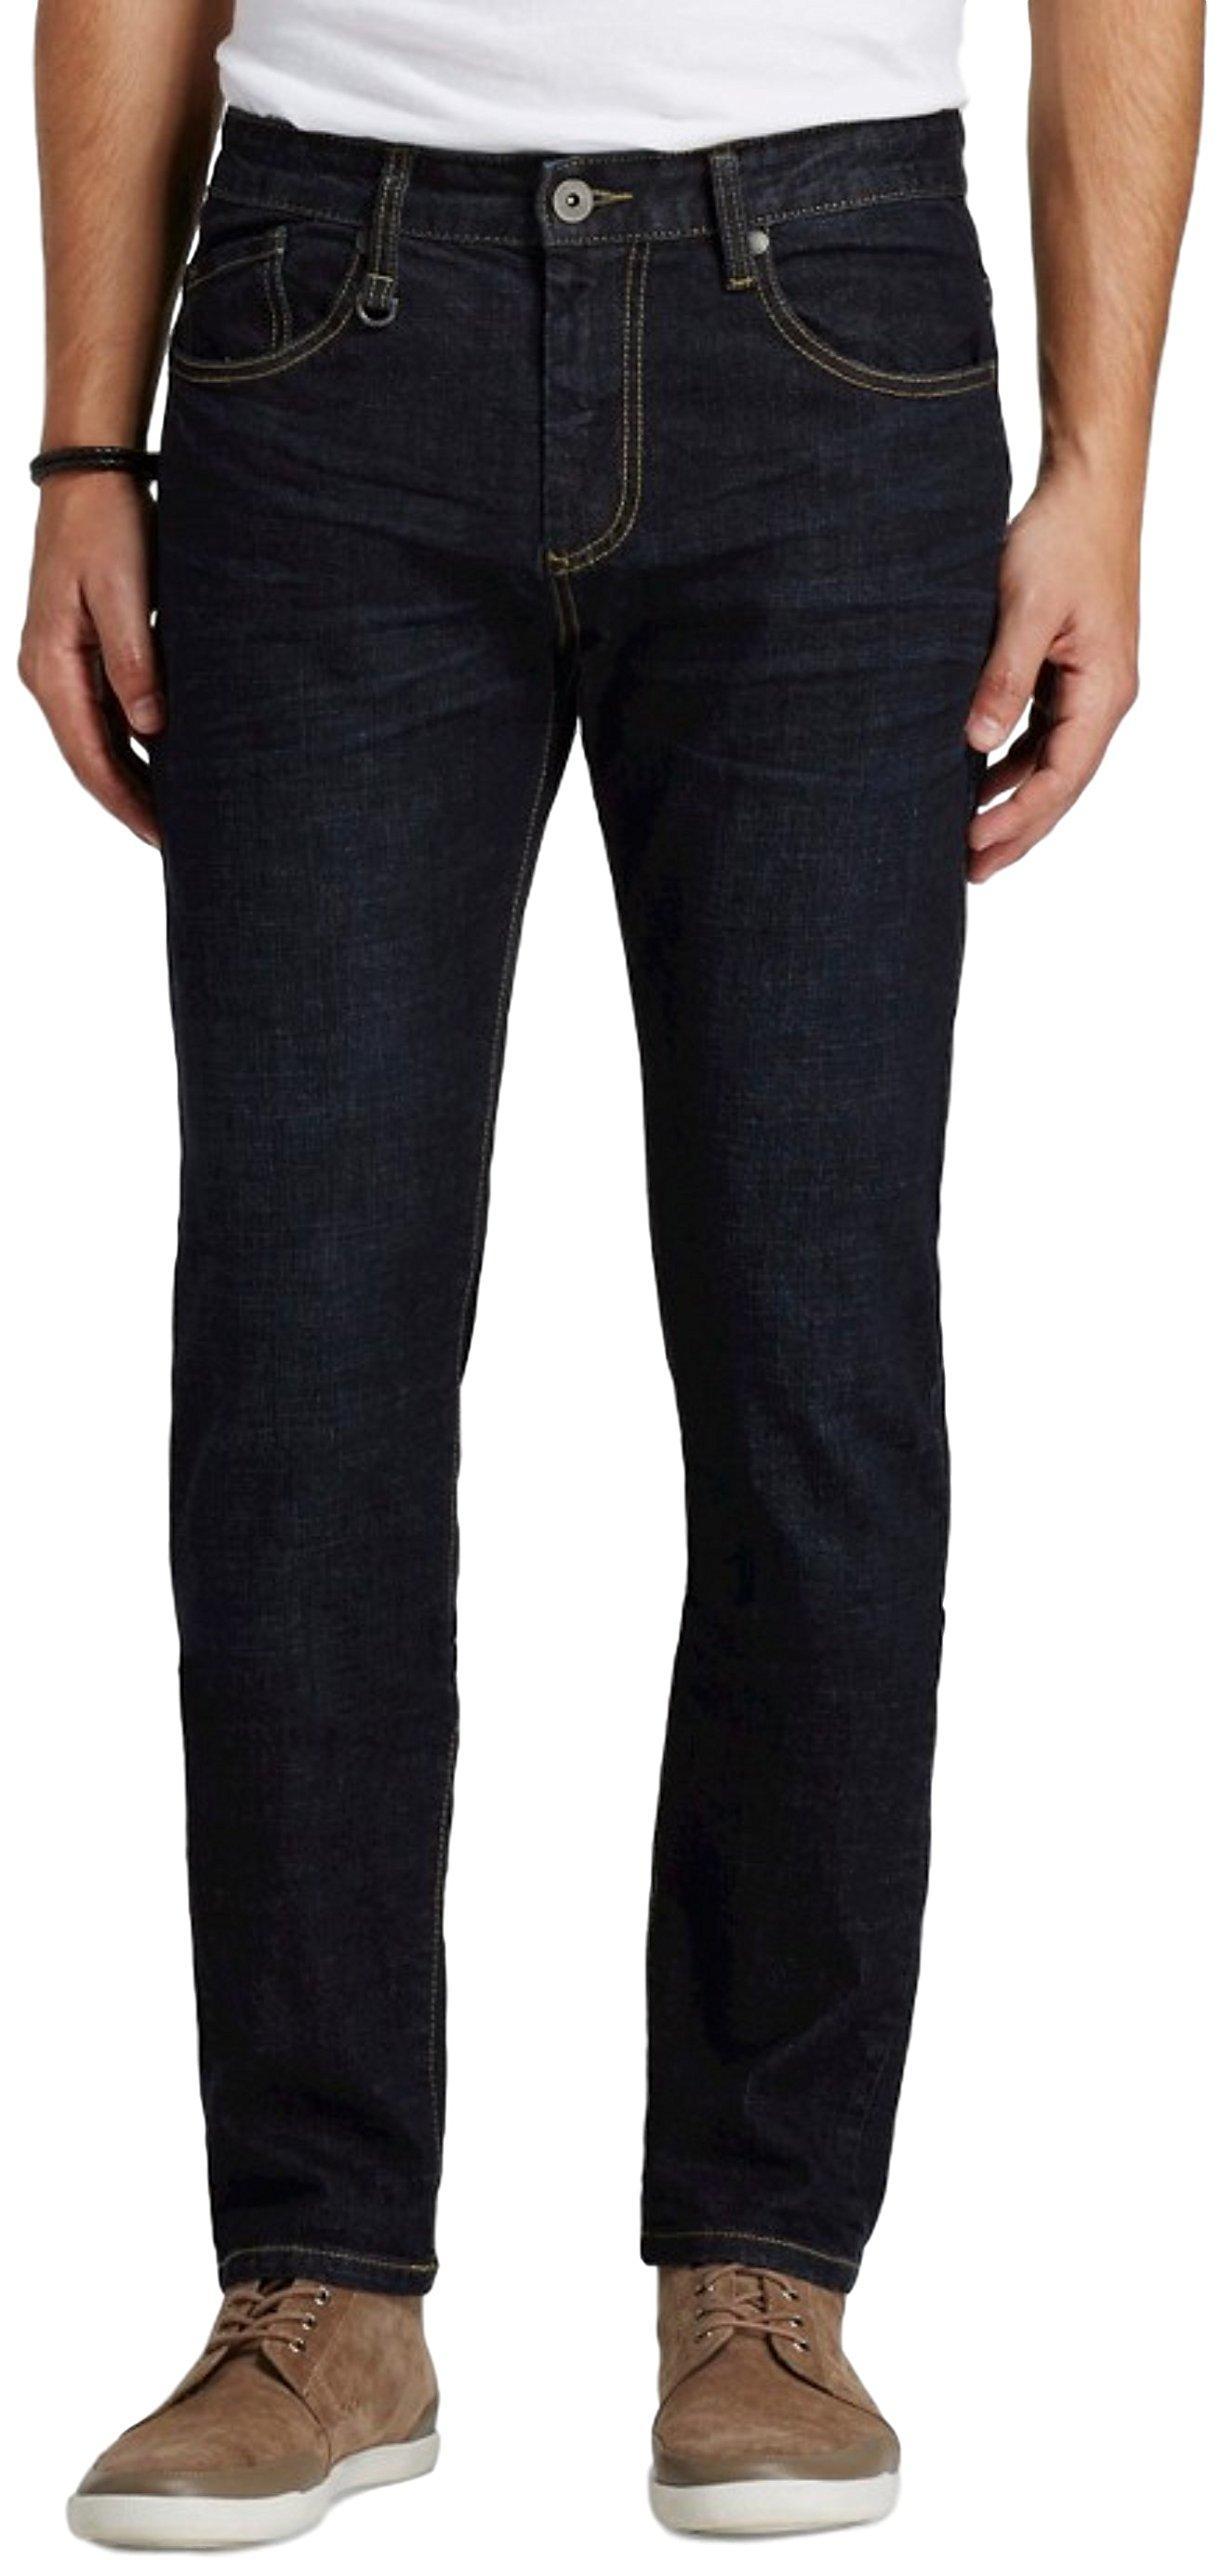 Modern Threads by Well Versed Men's Slim Tapered Fit Jeans (30X30, Darkest Blue)